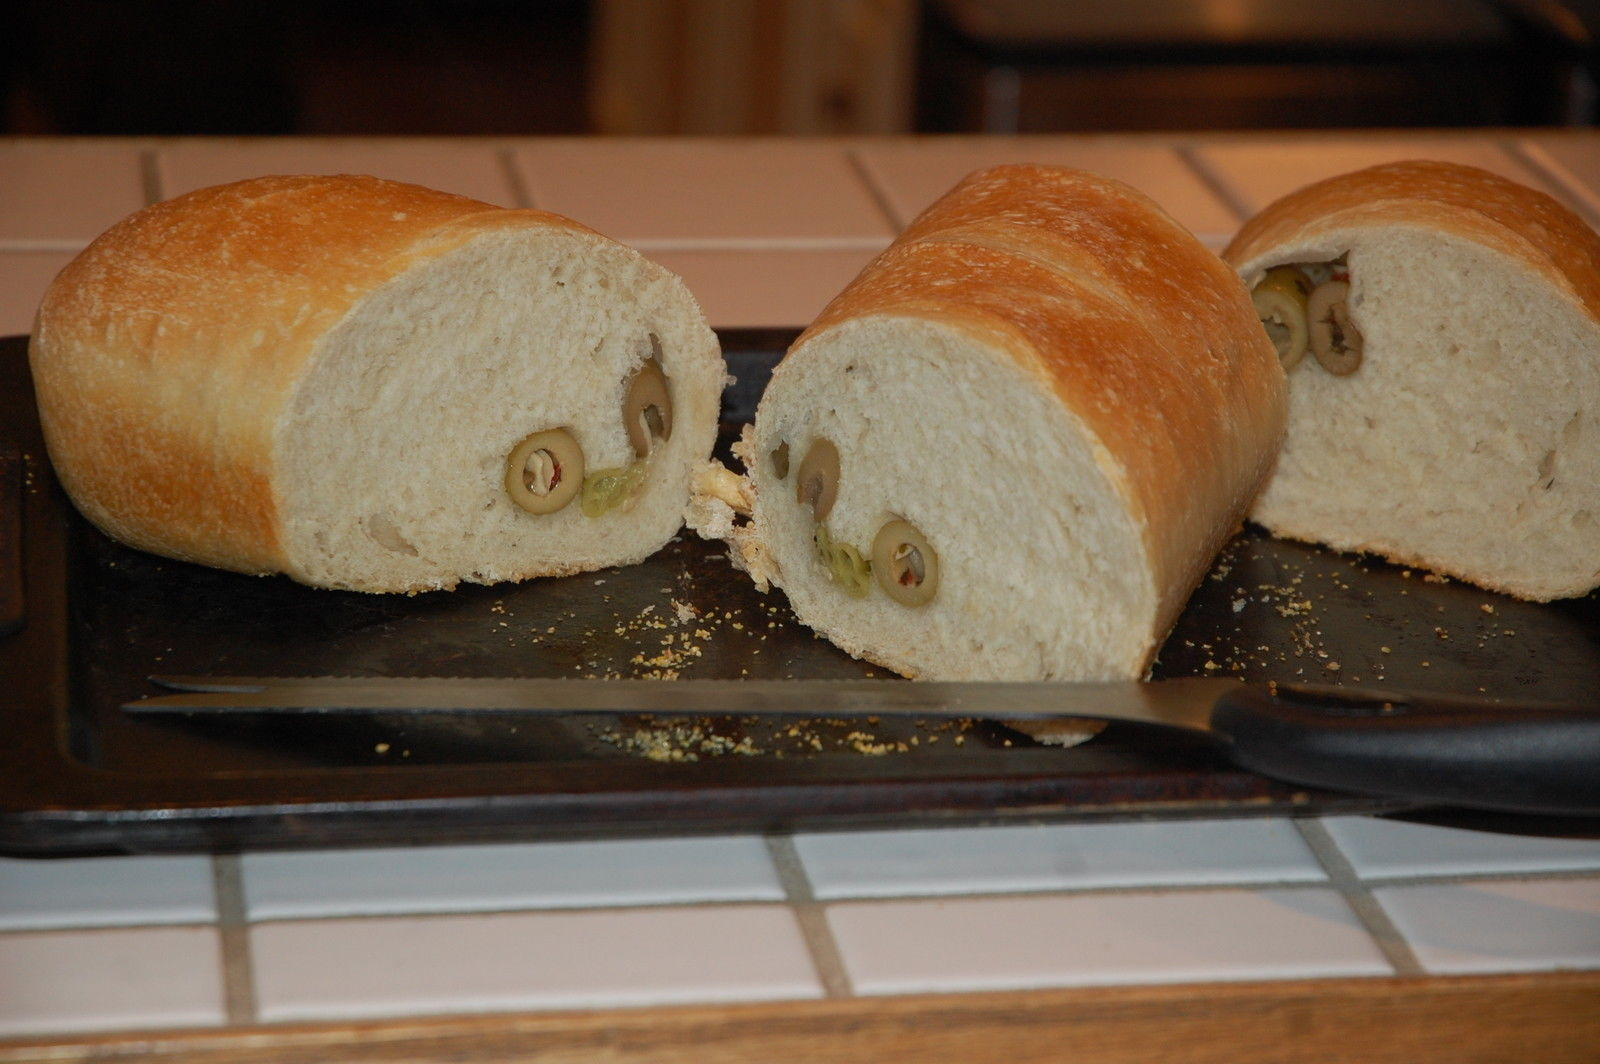 !!!!SOURDOUGH STARTER flour 150+yrs california gold rush country + recipes larry